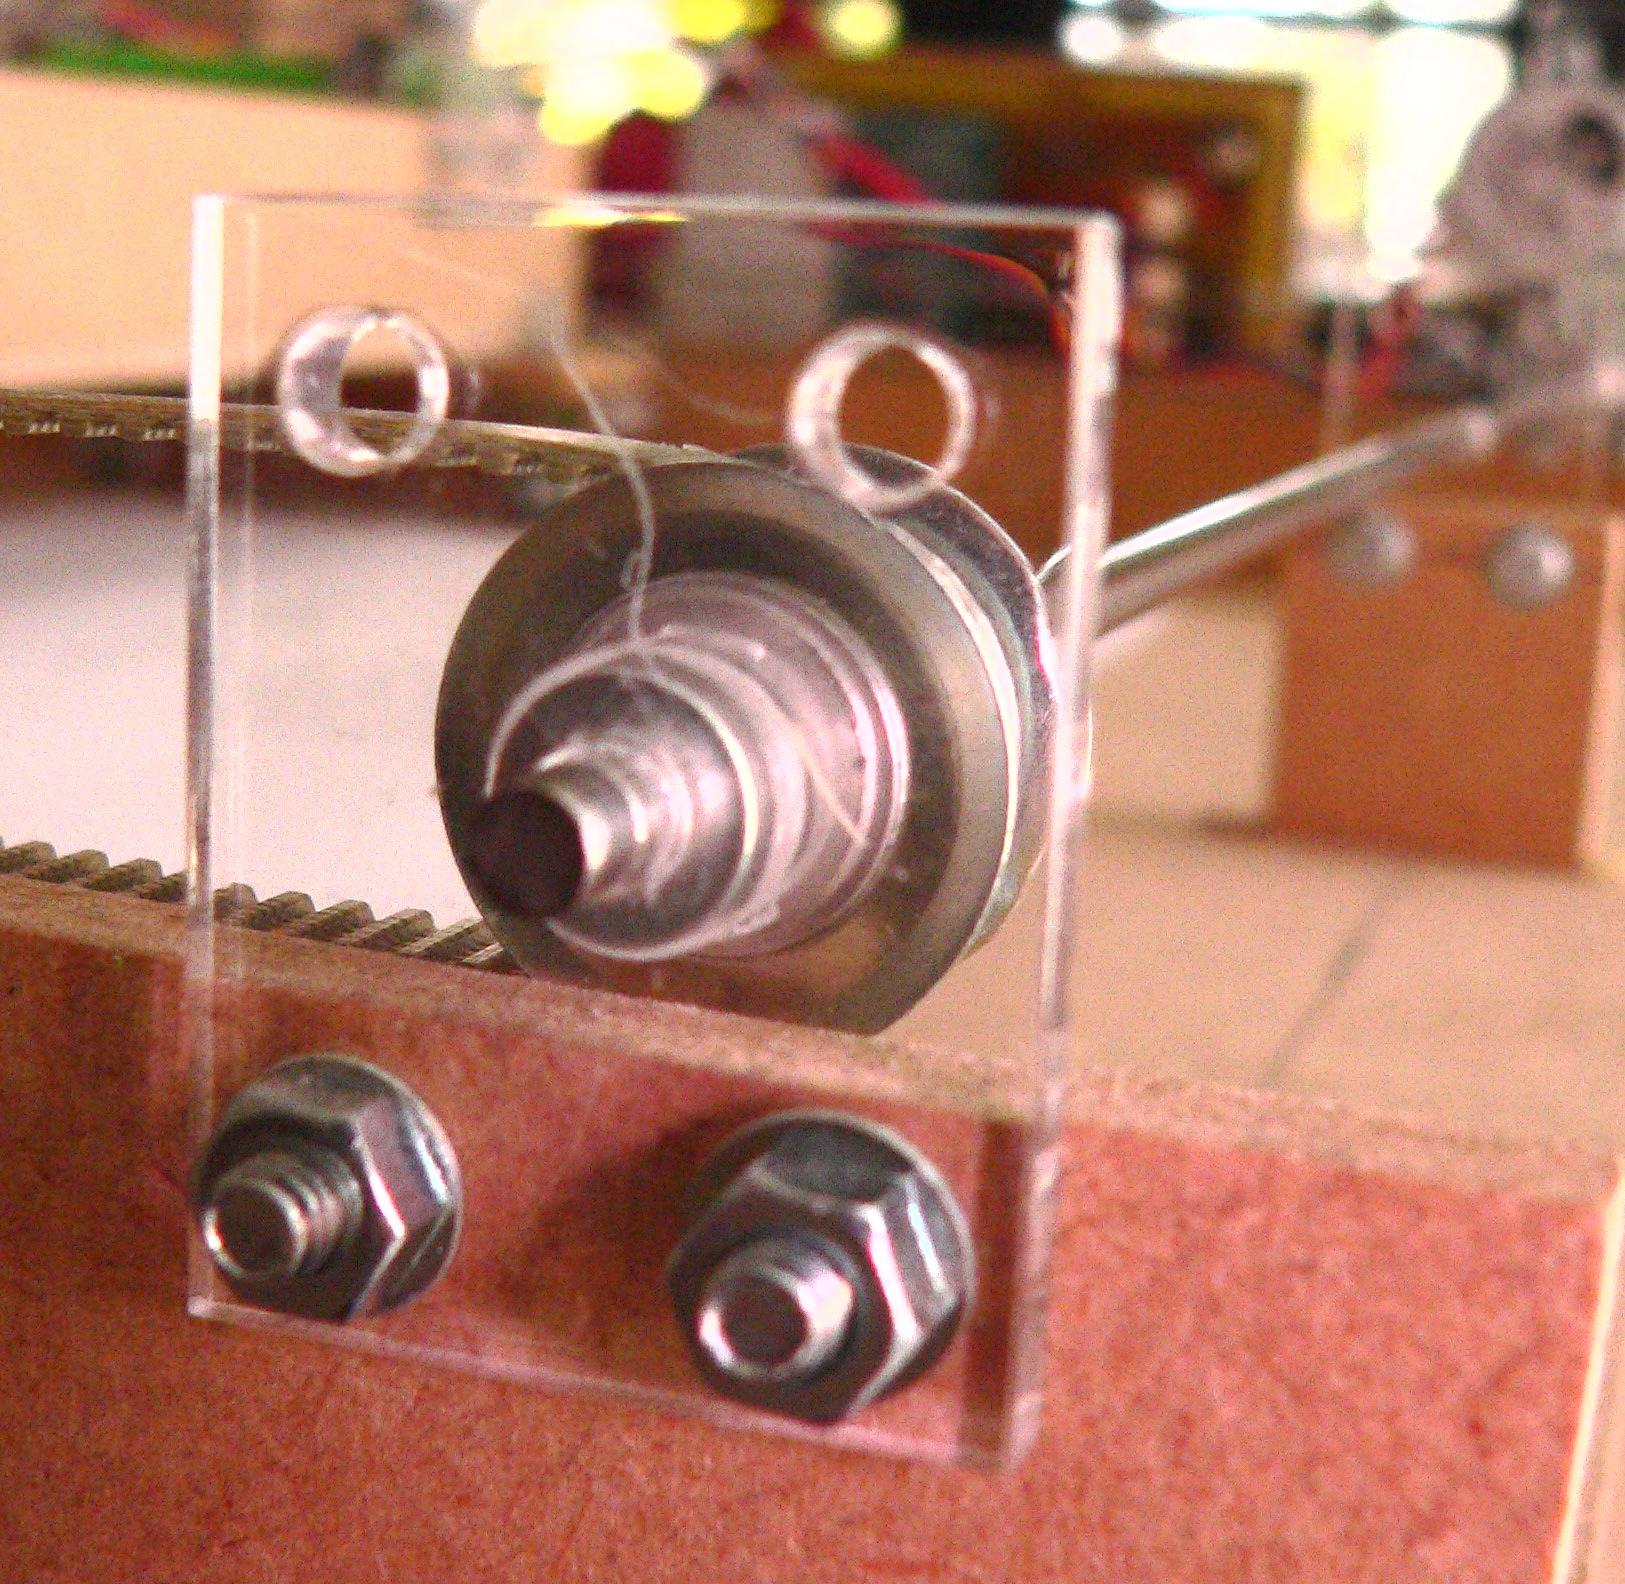 Axle bearing close-up